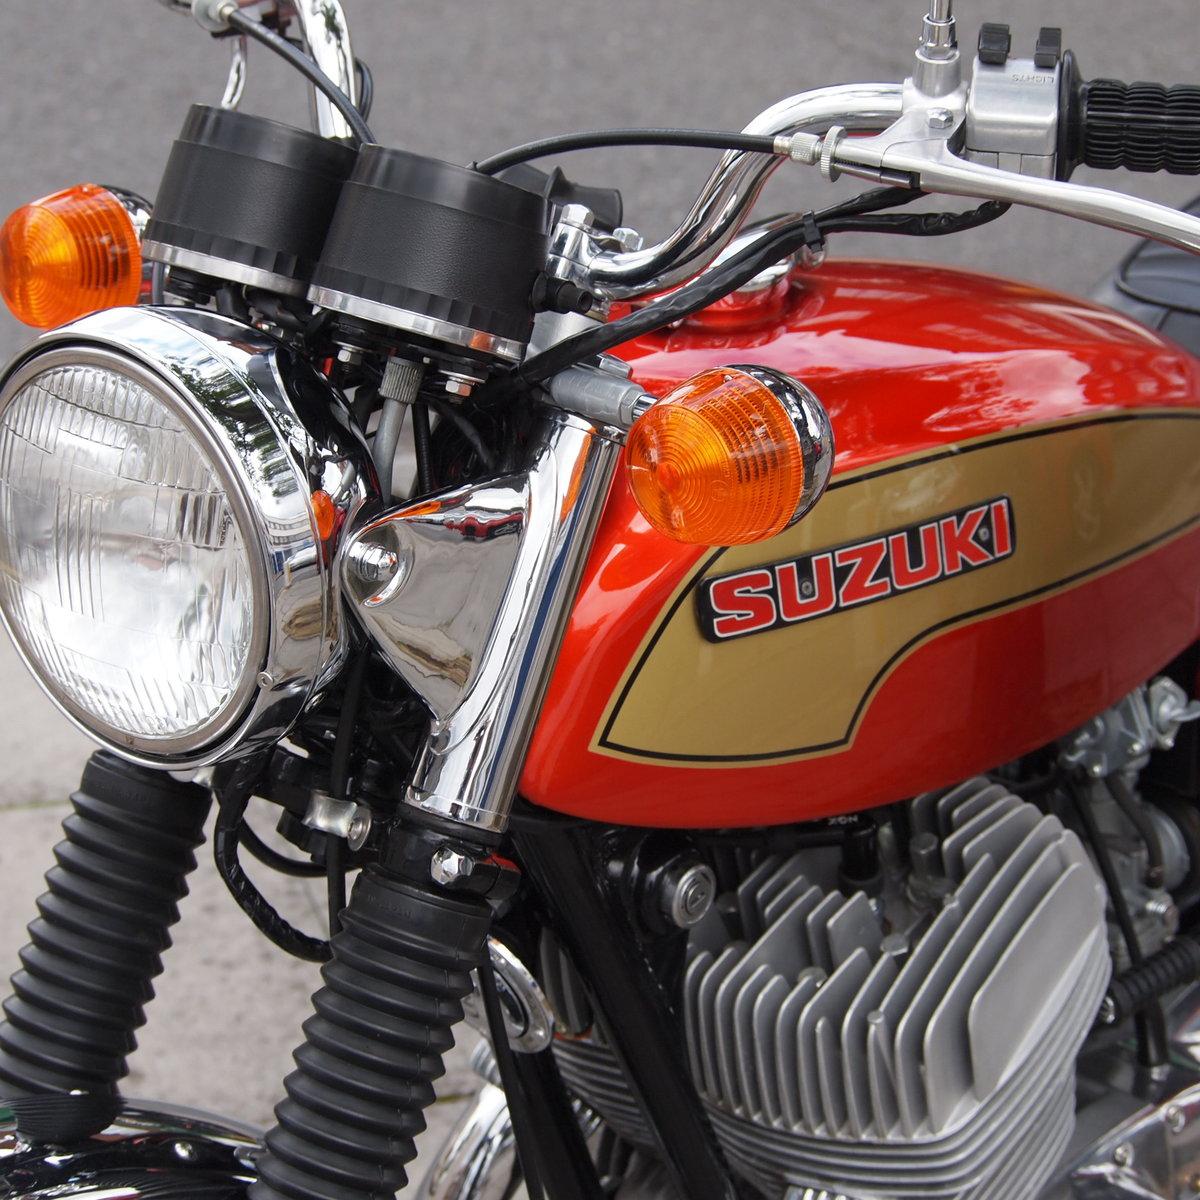 1974 Suzuki T500 In Beautiful Condition SOLD (picture 5 of 6)